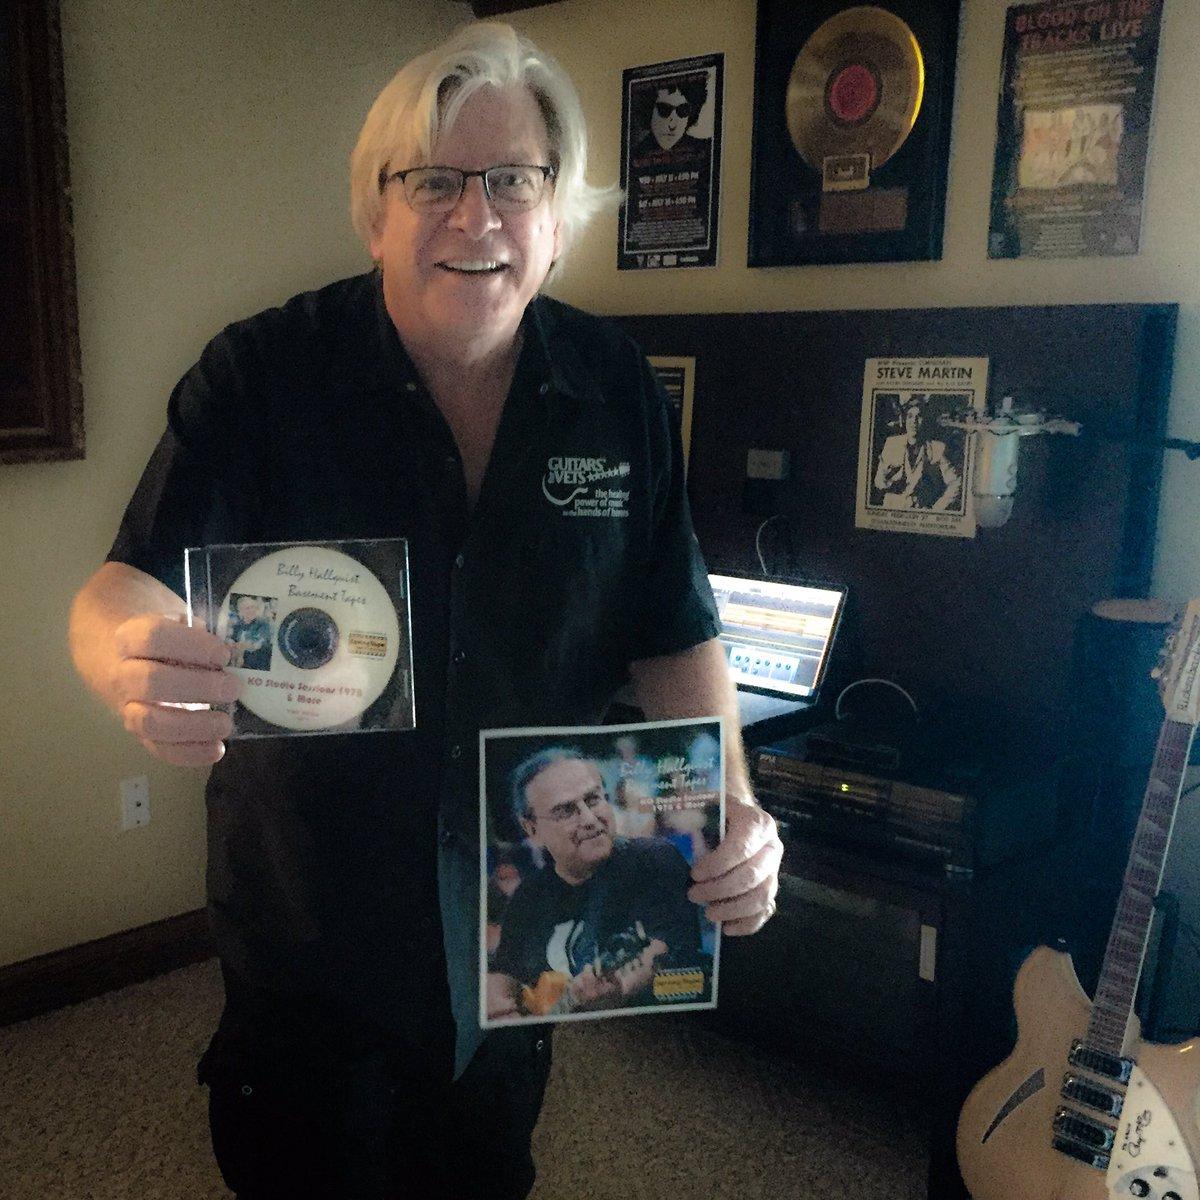 Billy Hallquist Basement Tapes - Kevin Odegard / Saving Tape / Cambridge, Minnesota /July 29th, 2016